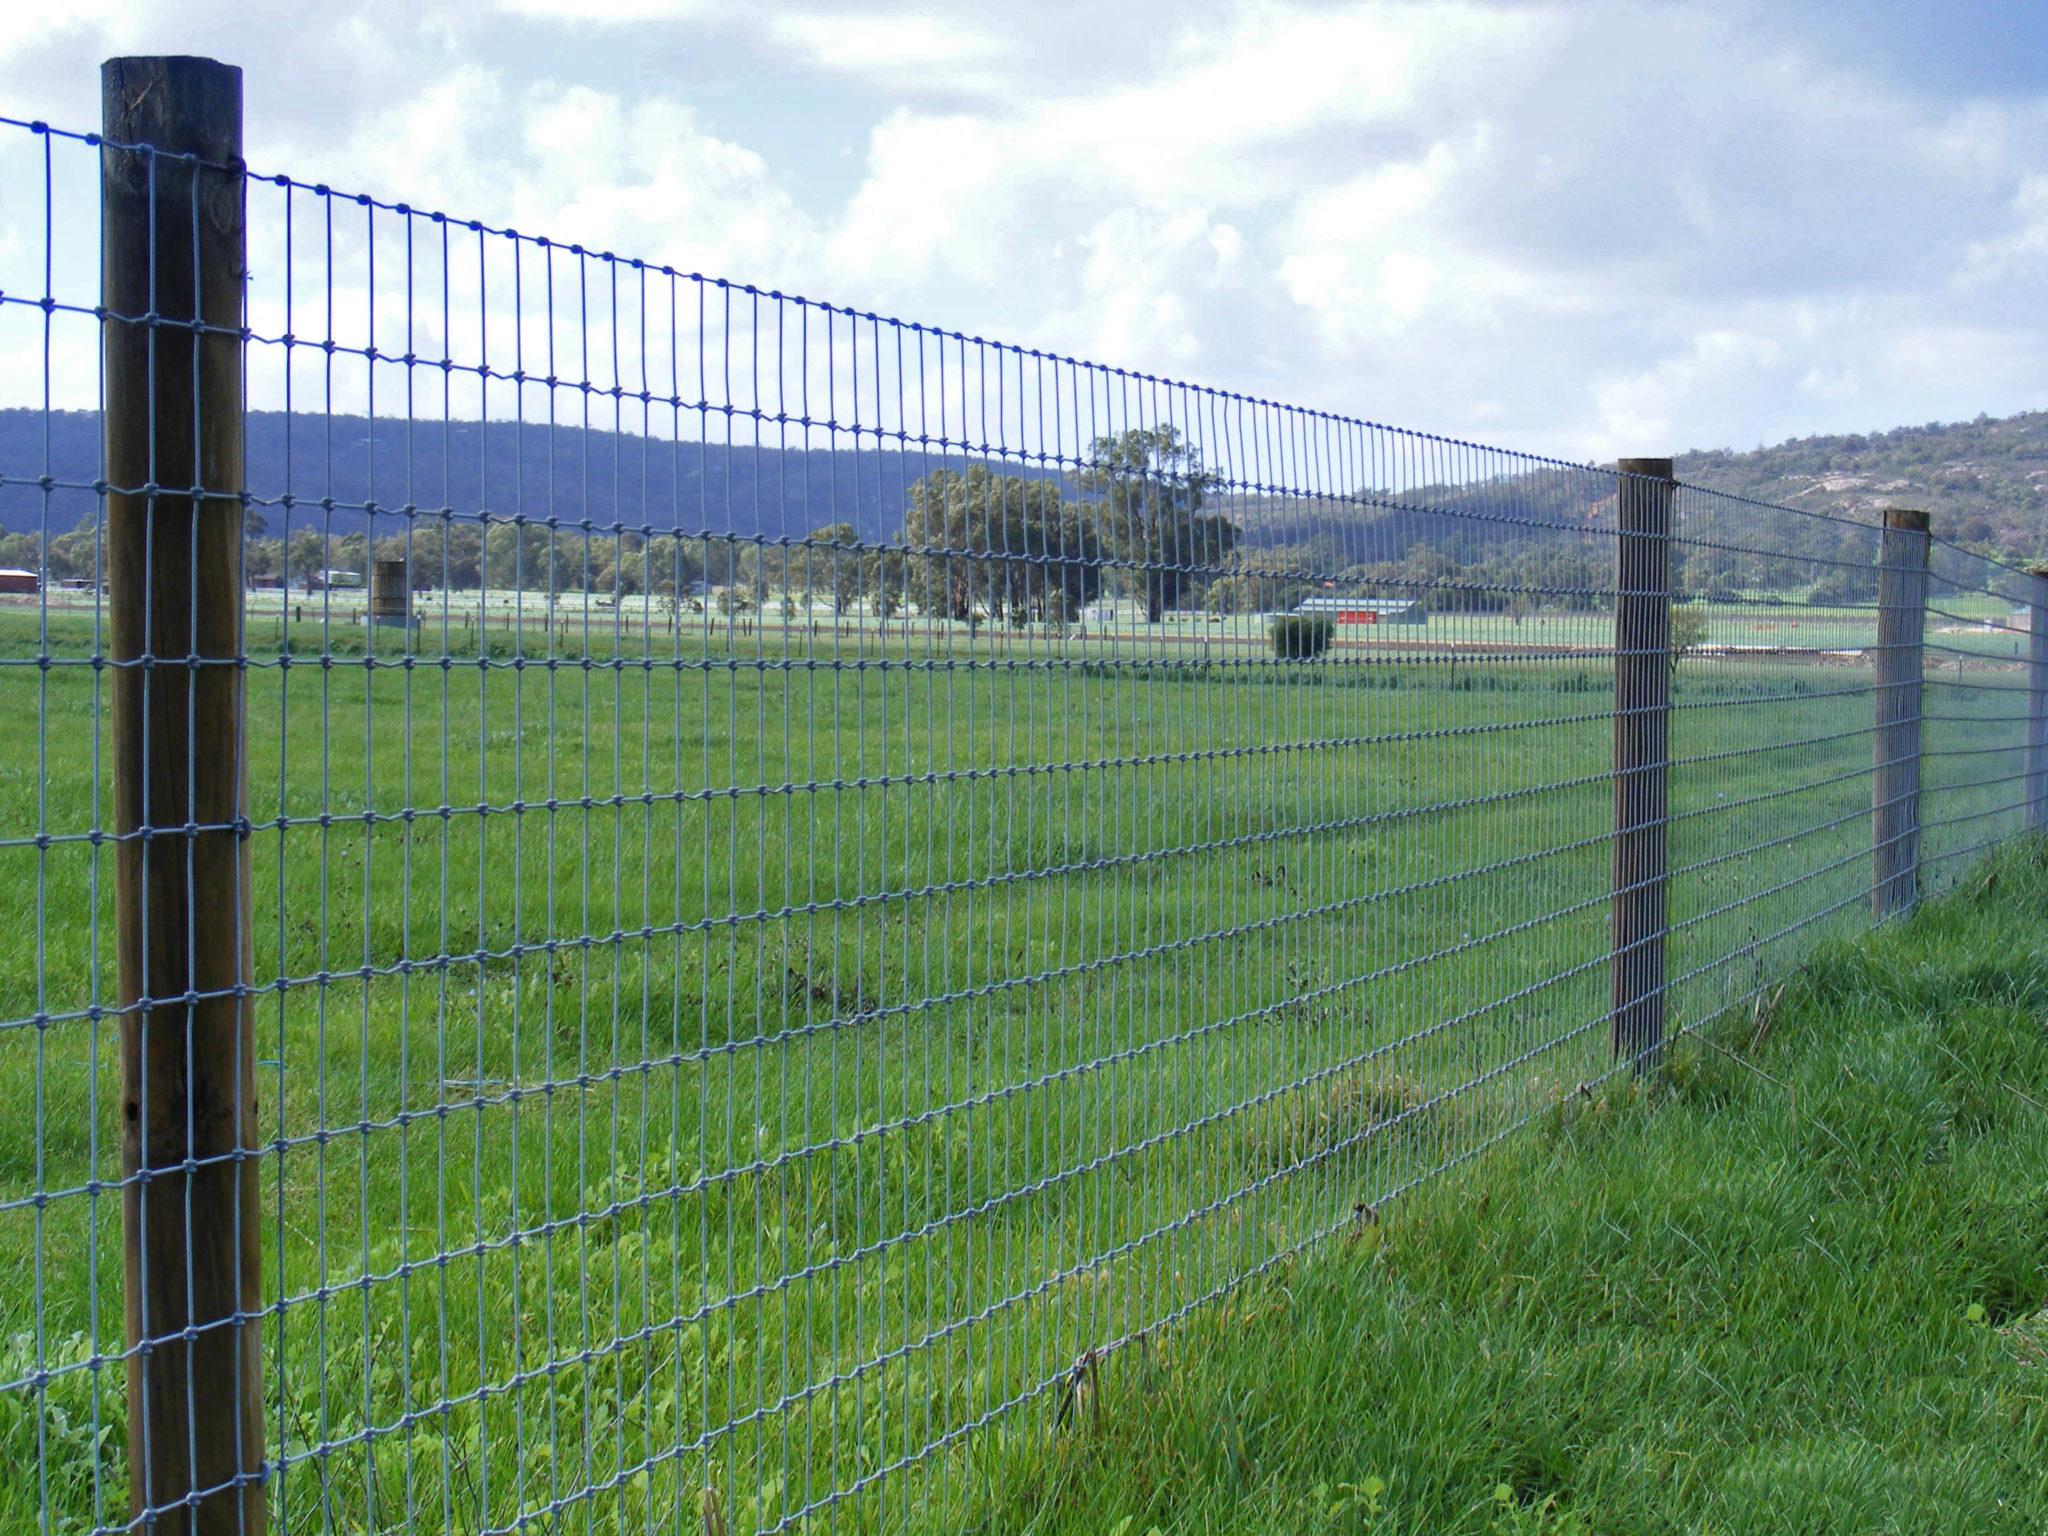 Bull Barn S-Knot fence